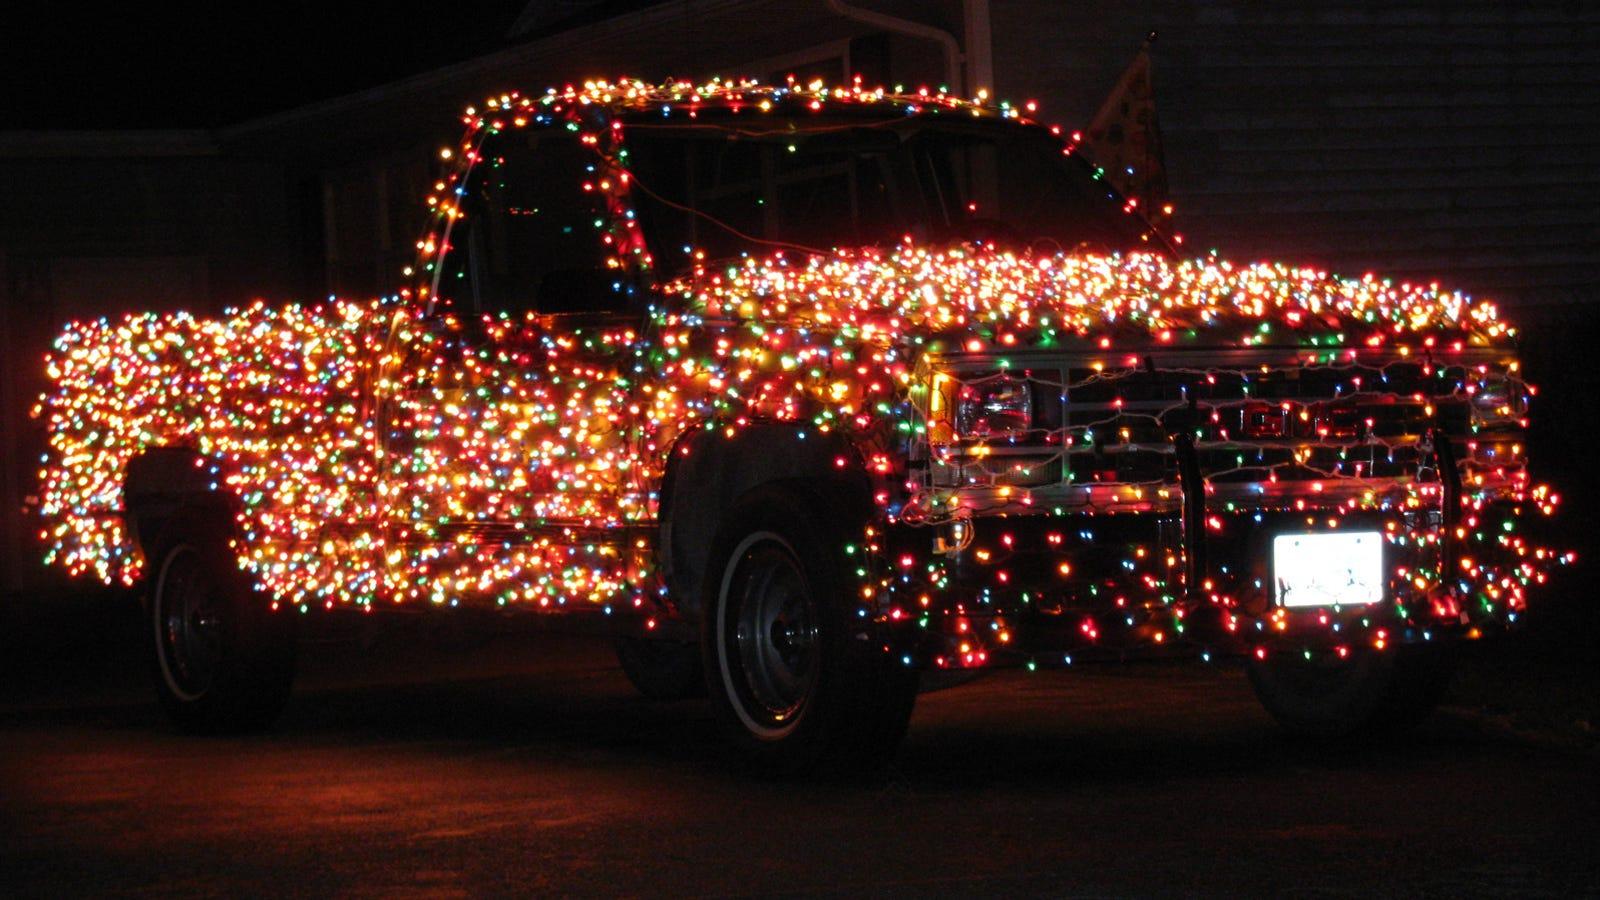 Redneck Christmas Parade 2020 Bawcomville Redneck Christmas Parade 2020 Ford | Aktpfv